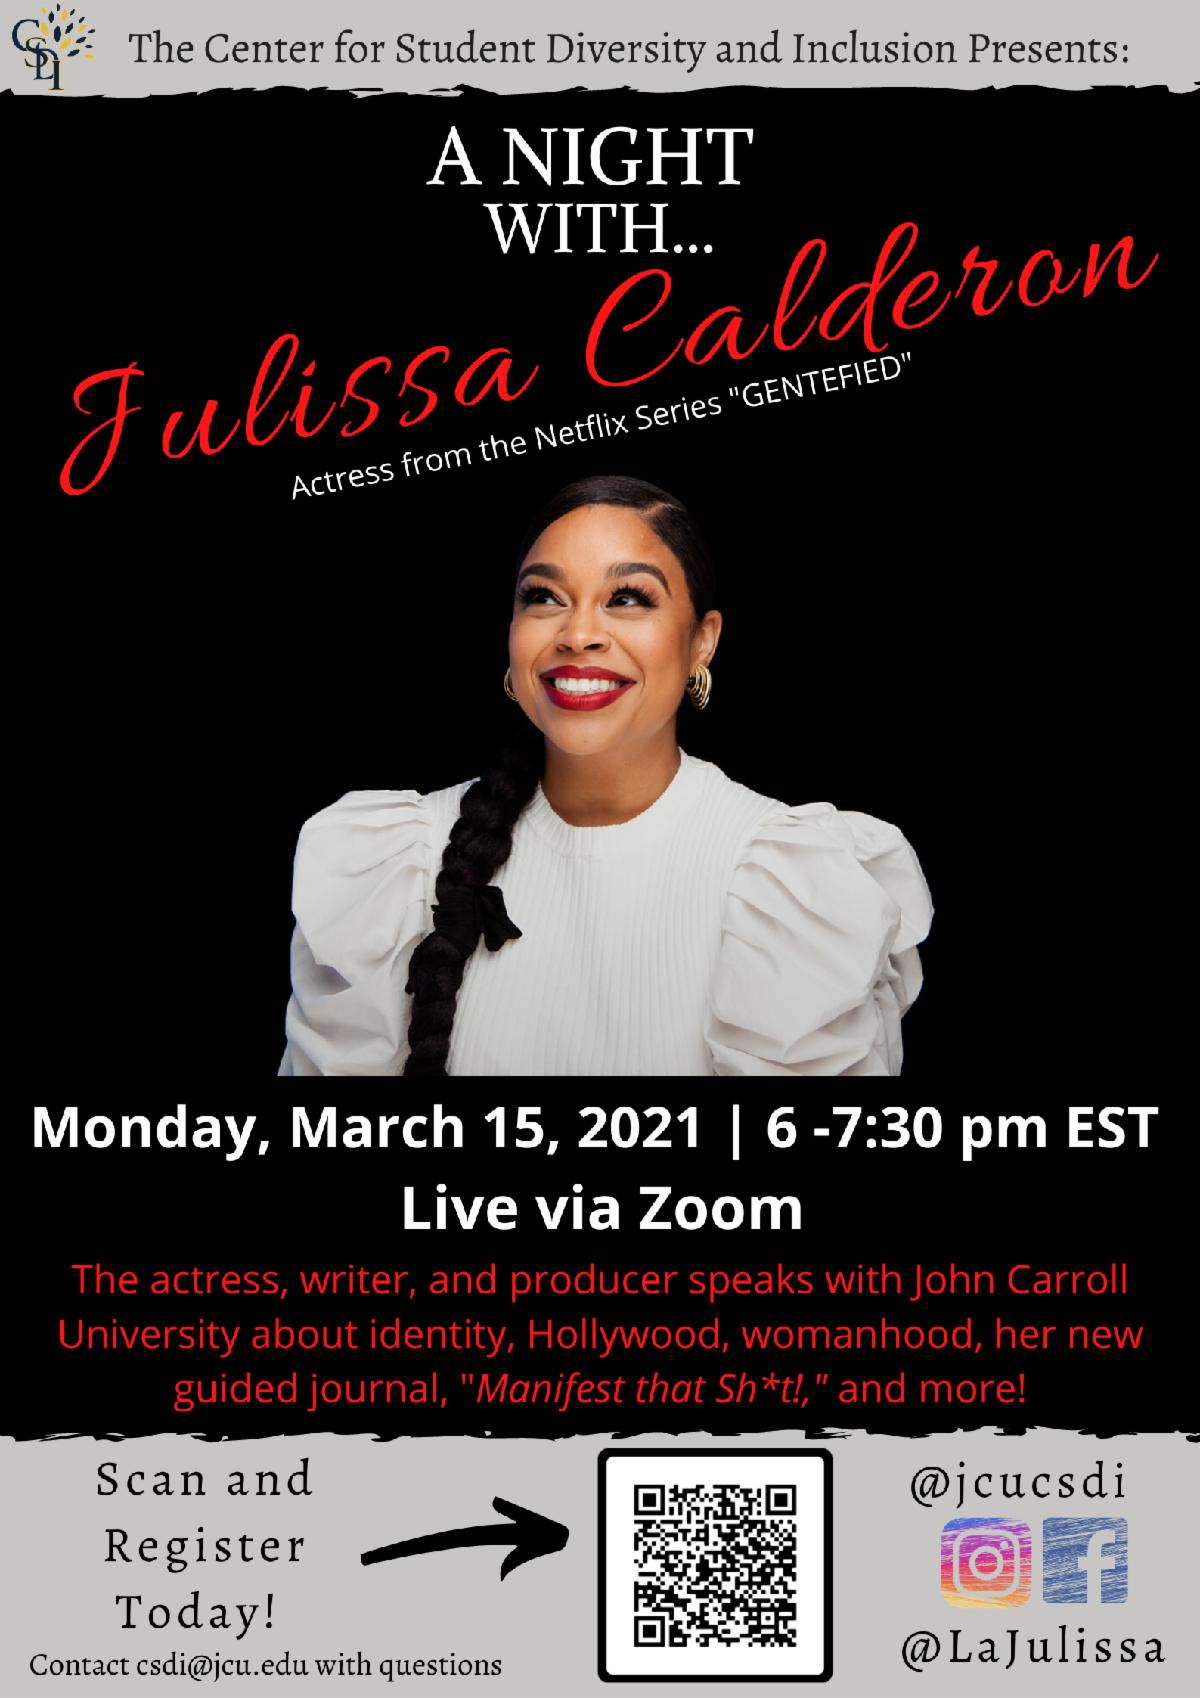 promo image for Julissa Calderon event